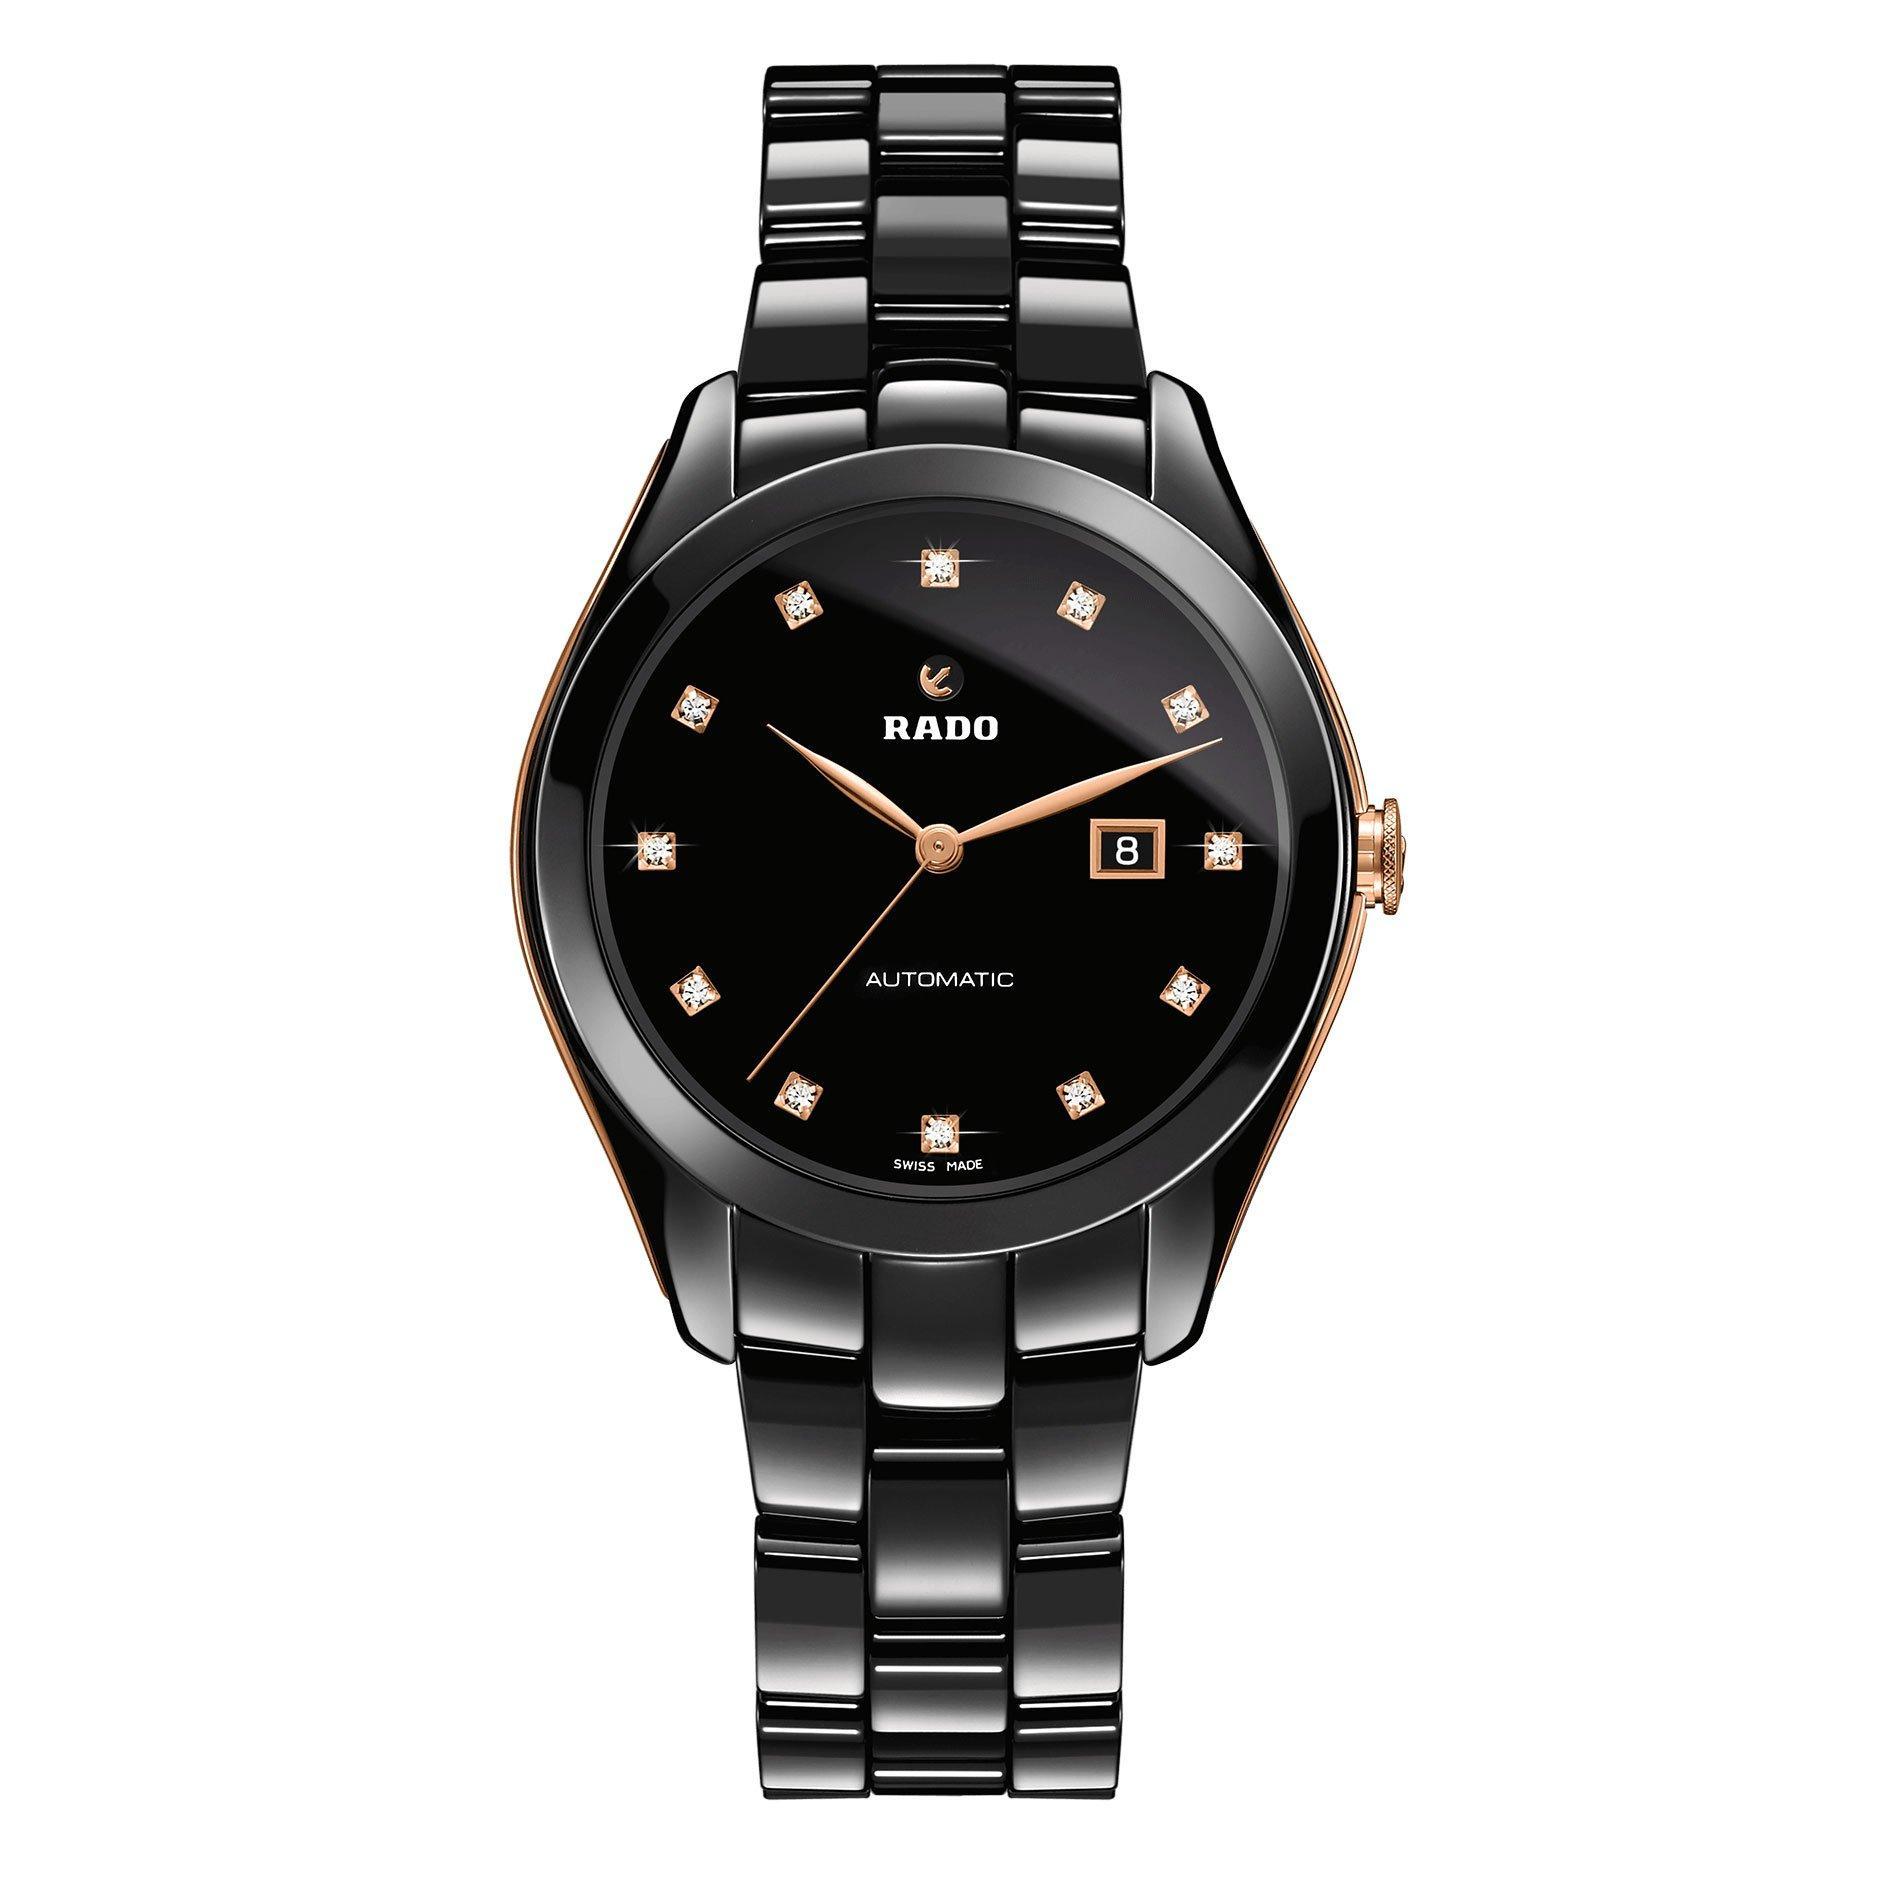 Rado Hyperchrome Automatic Diamonds Limited Edition Ladies Watch £1244 @ Beaverbrooks